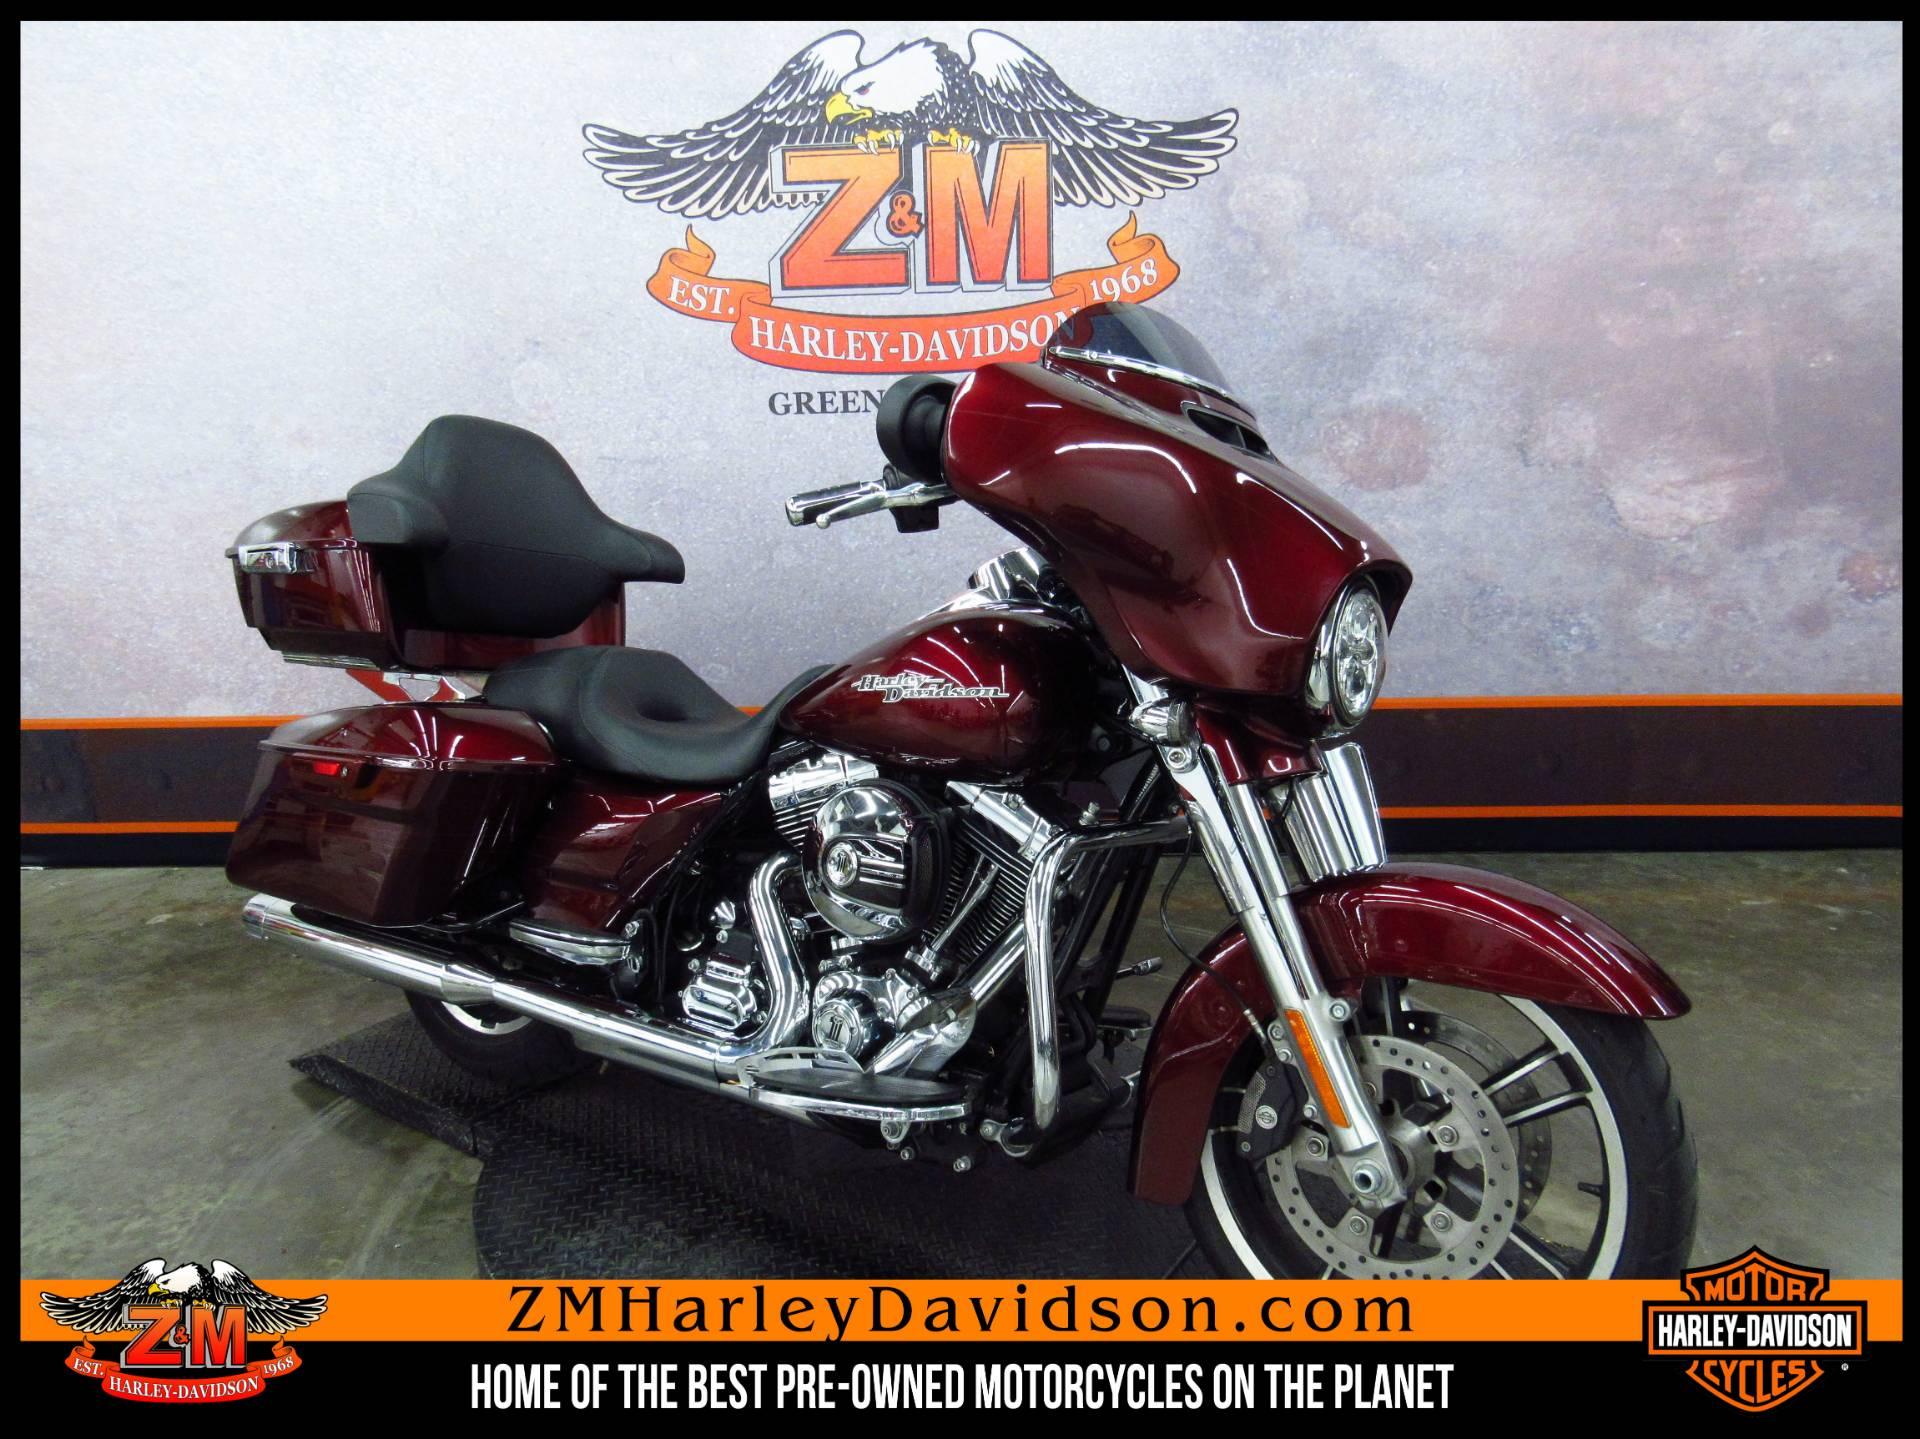 2014 Harley-Davidson Street Glide Special 2